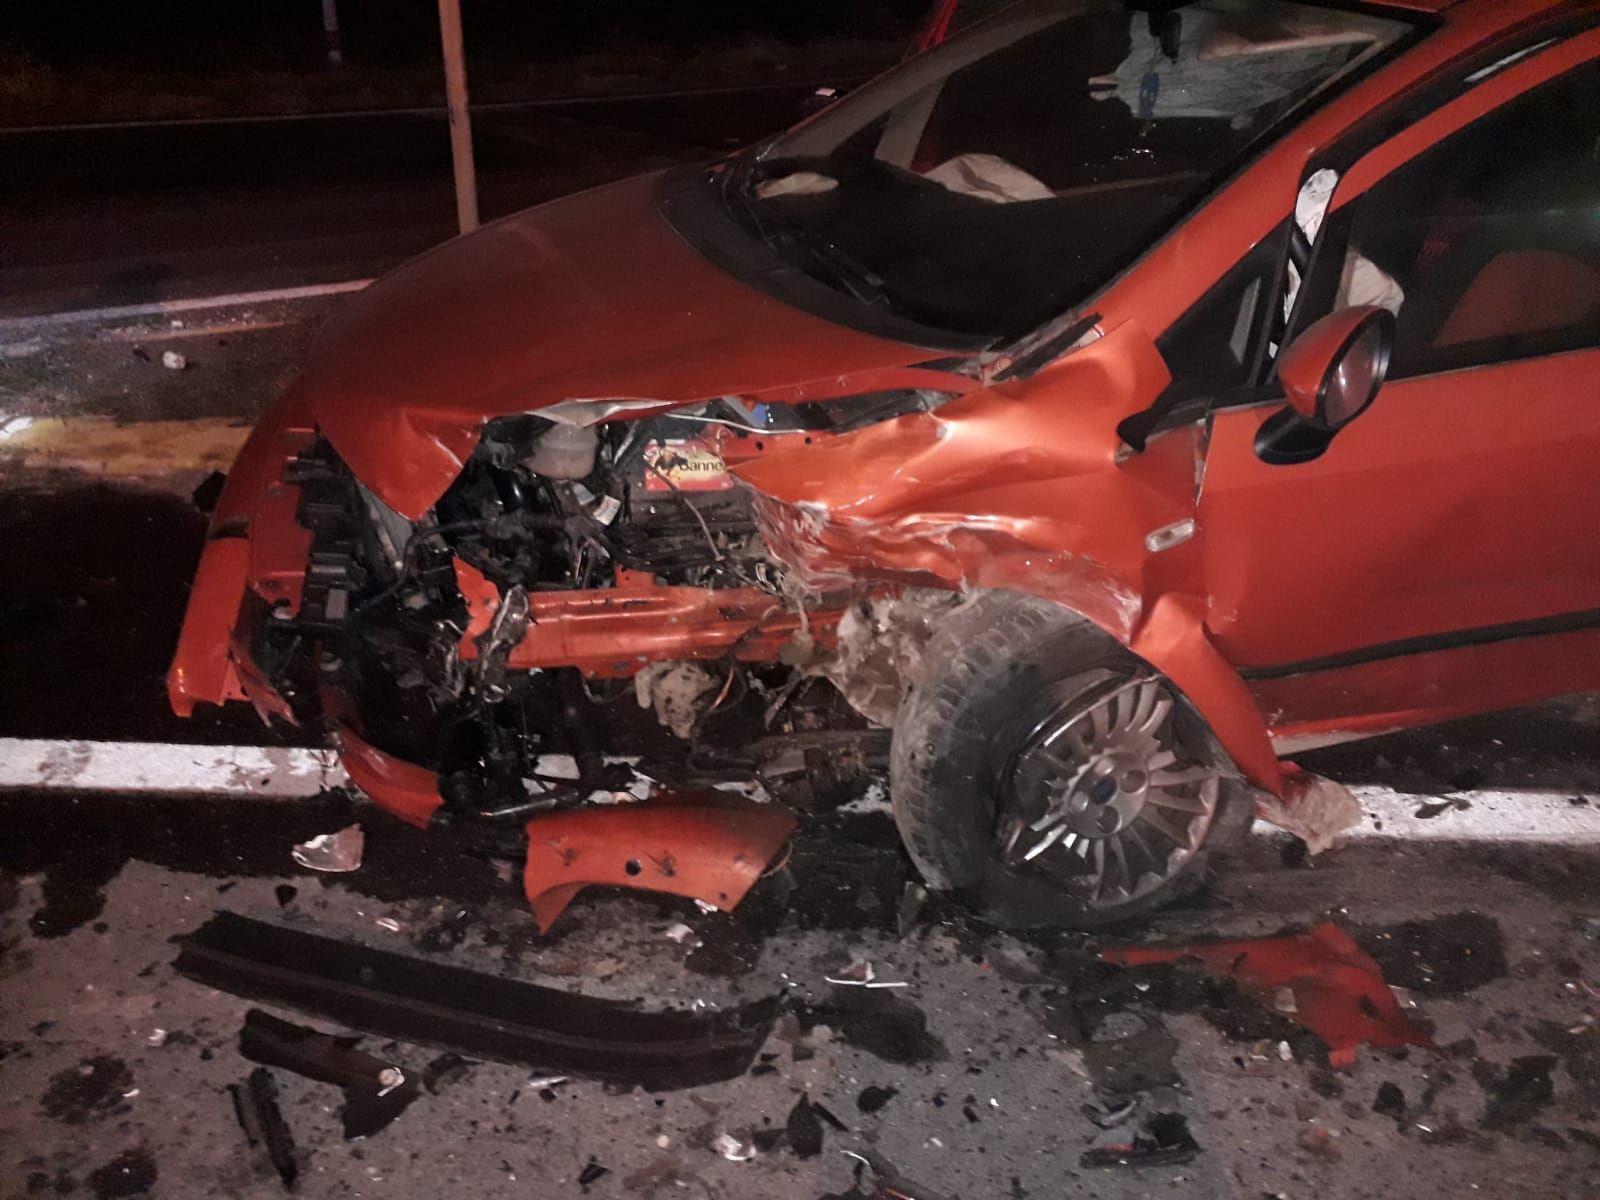 CANAVESE - Raffica di incidenti stradali, sei feriti in dodici ore